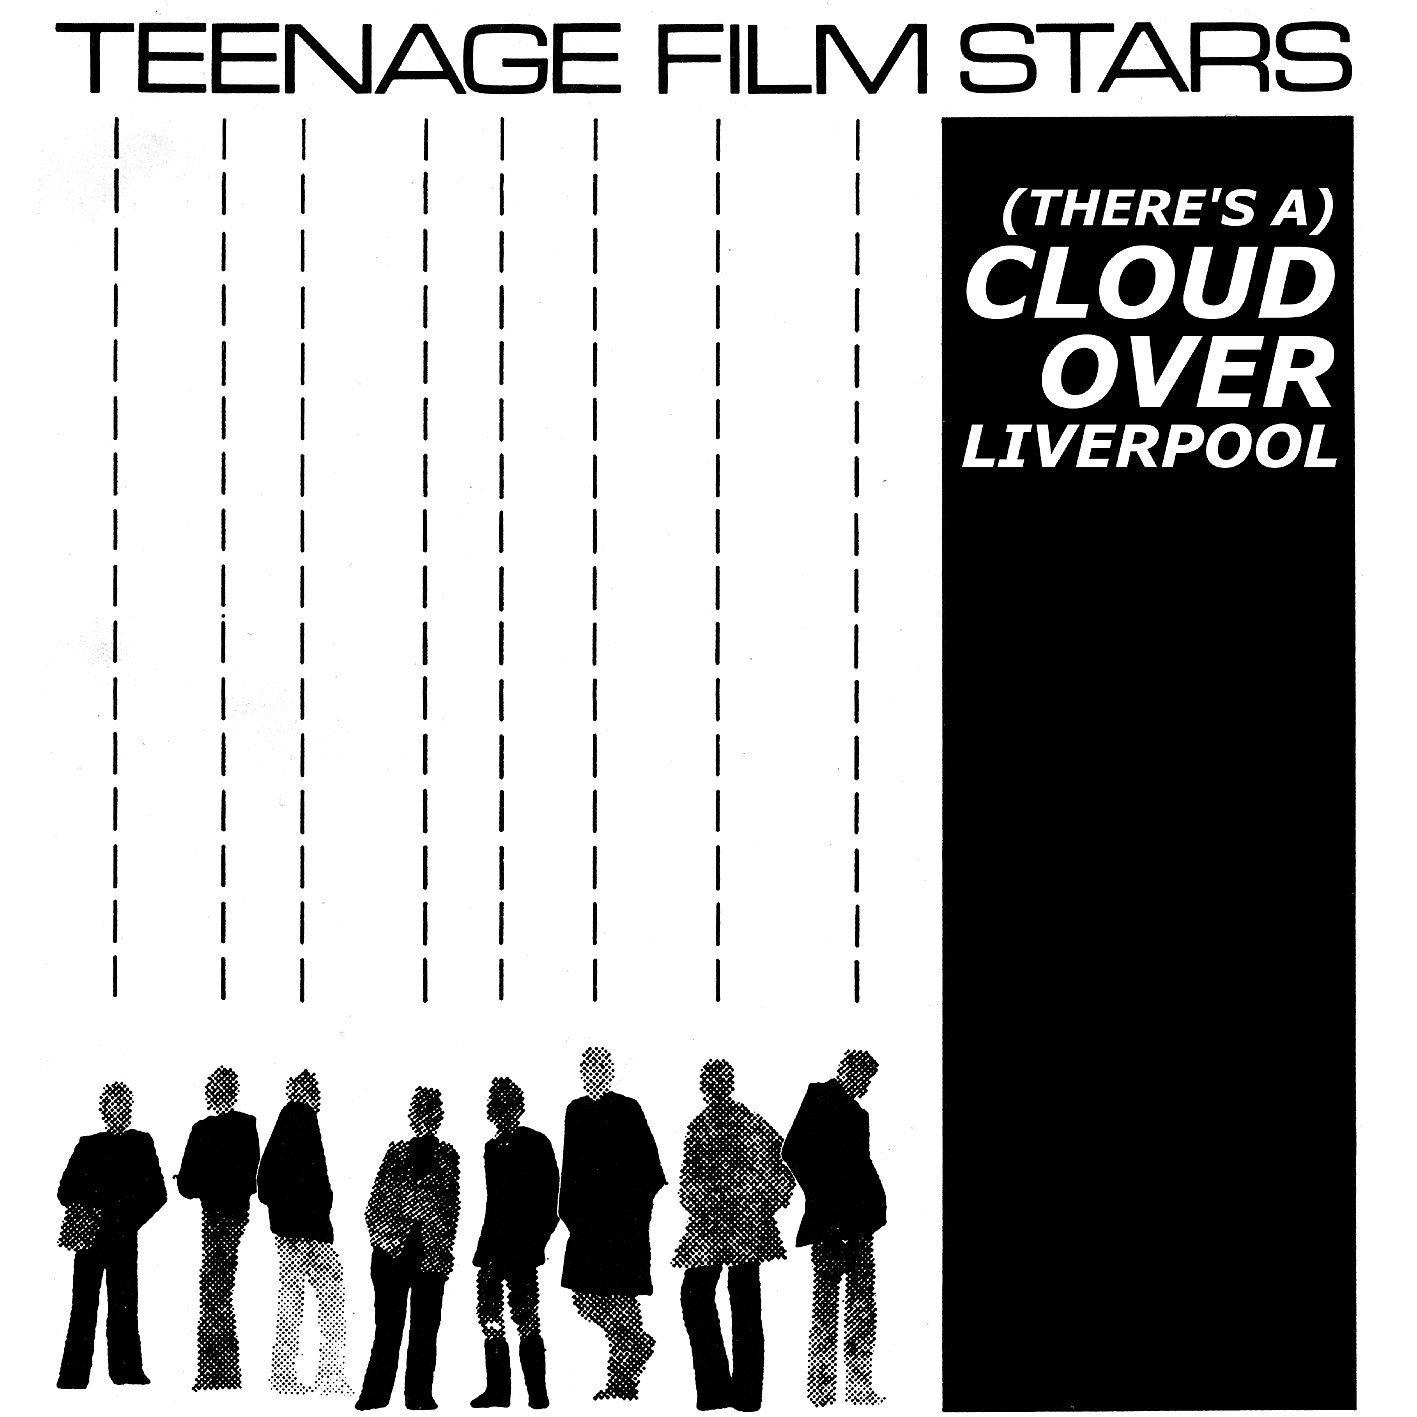 Vinilo : Teenage Filmstars - (there's A) Cloud Over Liverpool (LP Vinyl)